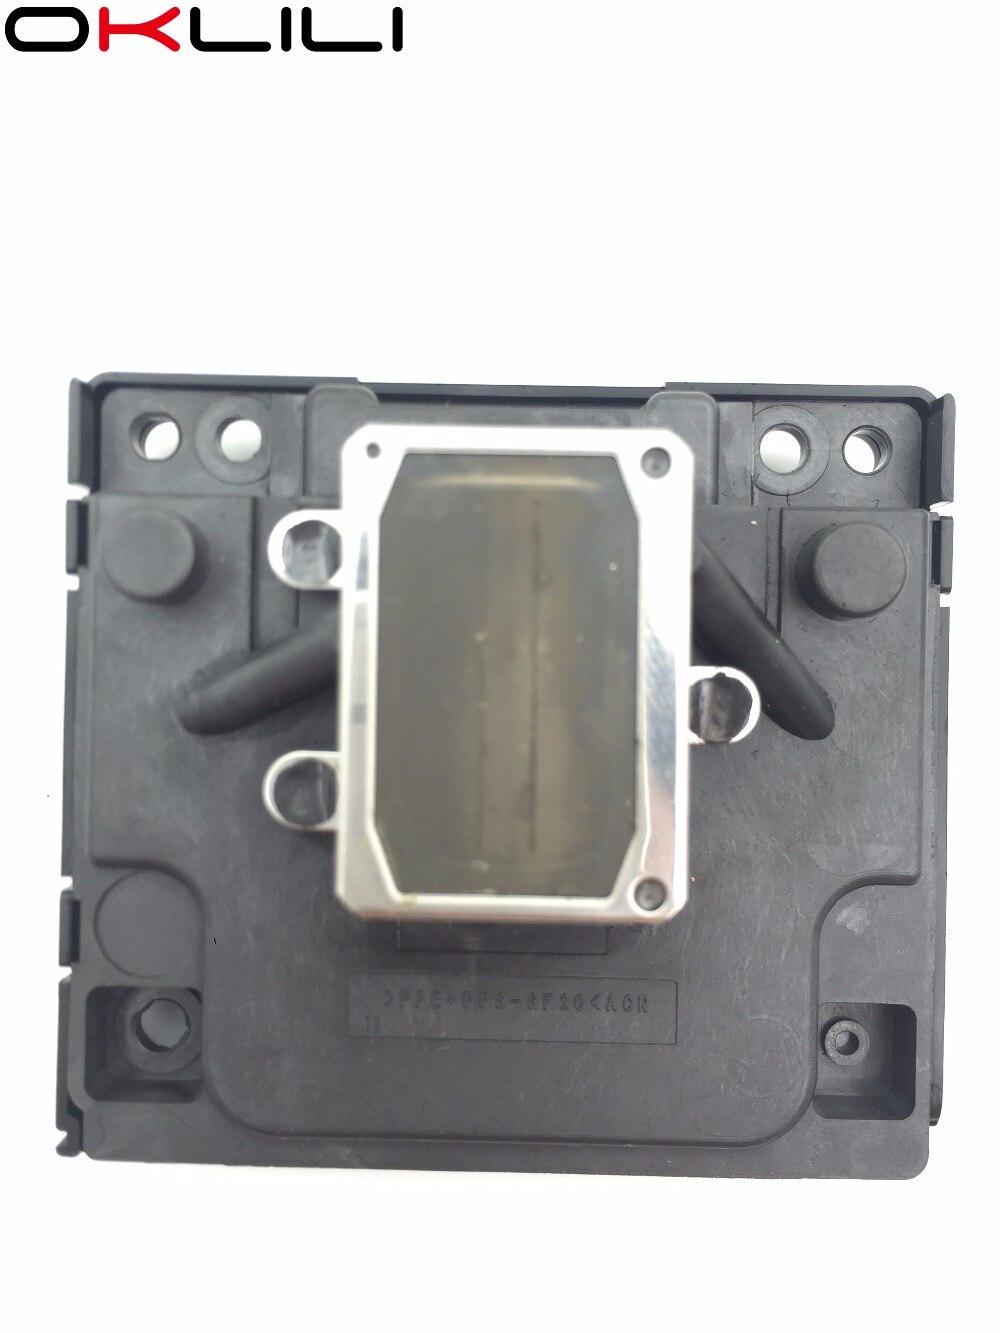 F169030 F181010 Printhead Print Head for Epson CX3700 ME2 ME200 TX300 TX105 TX100 C79 C91 T20 T26 T27 TX106 TX109 TX119 TX219 f09166 10 10pcs cx 20 007 receiver board for cheerson cx 20 cx20 rc quadcopter parts